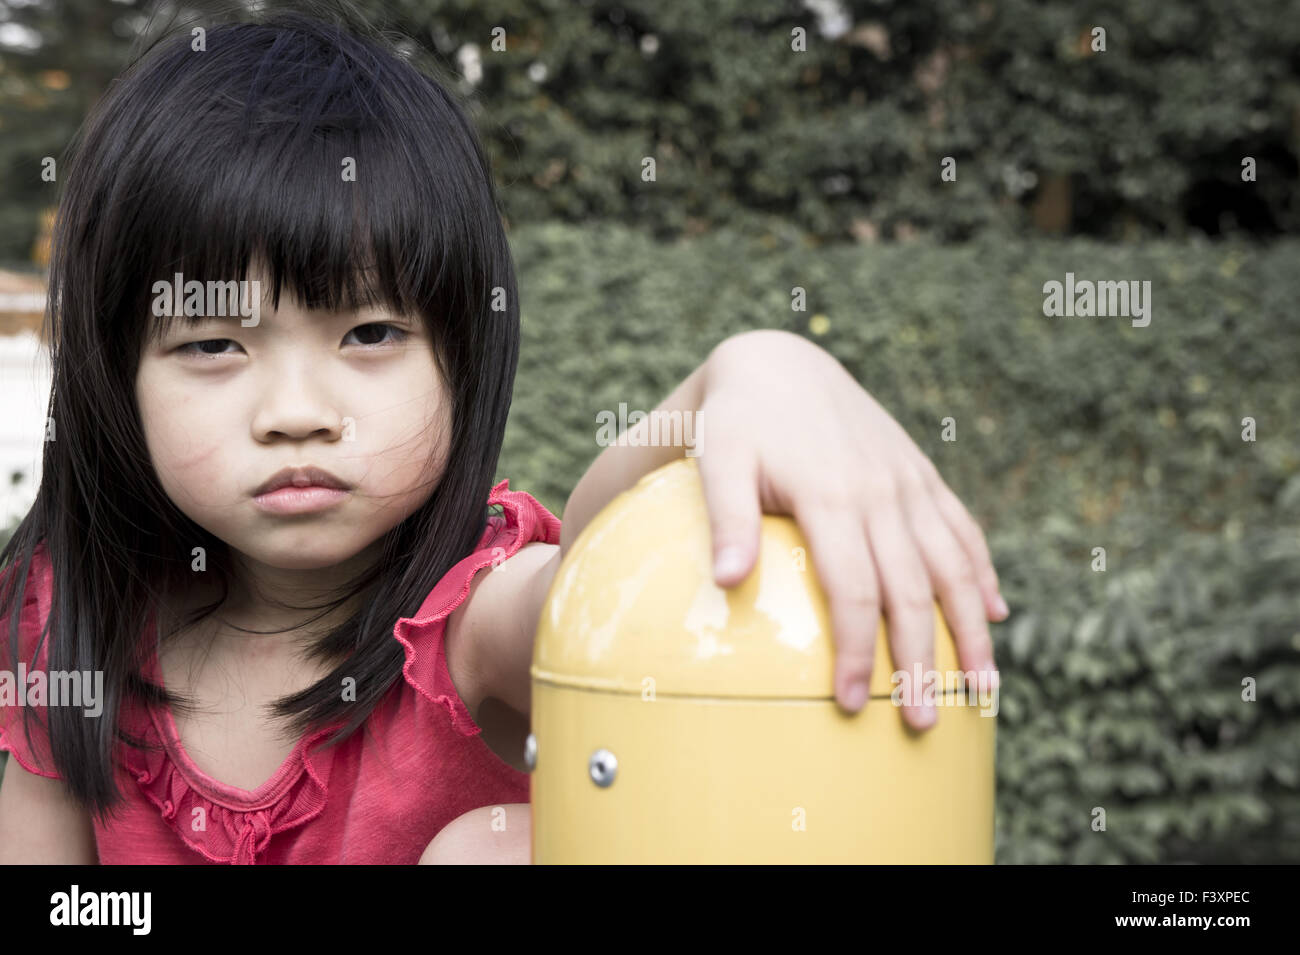 Abandonner la fille Photo Stock